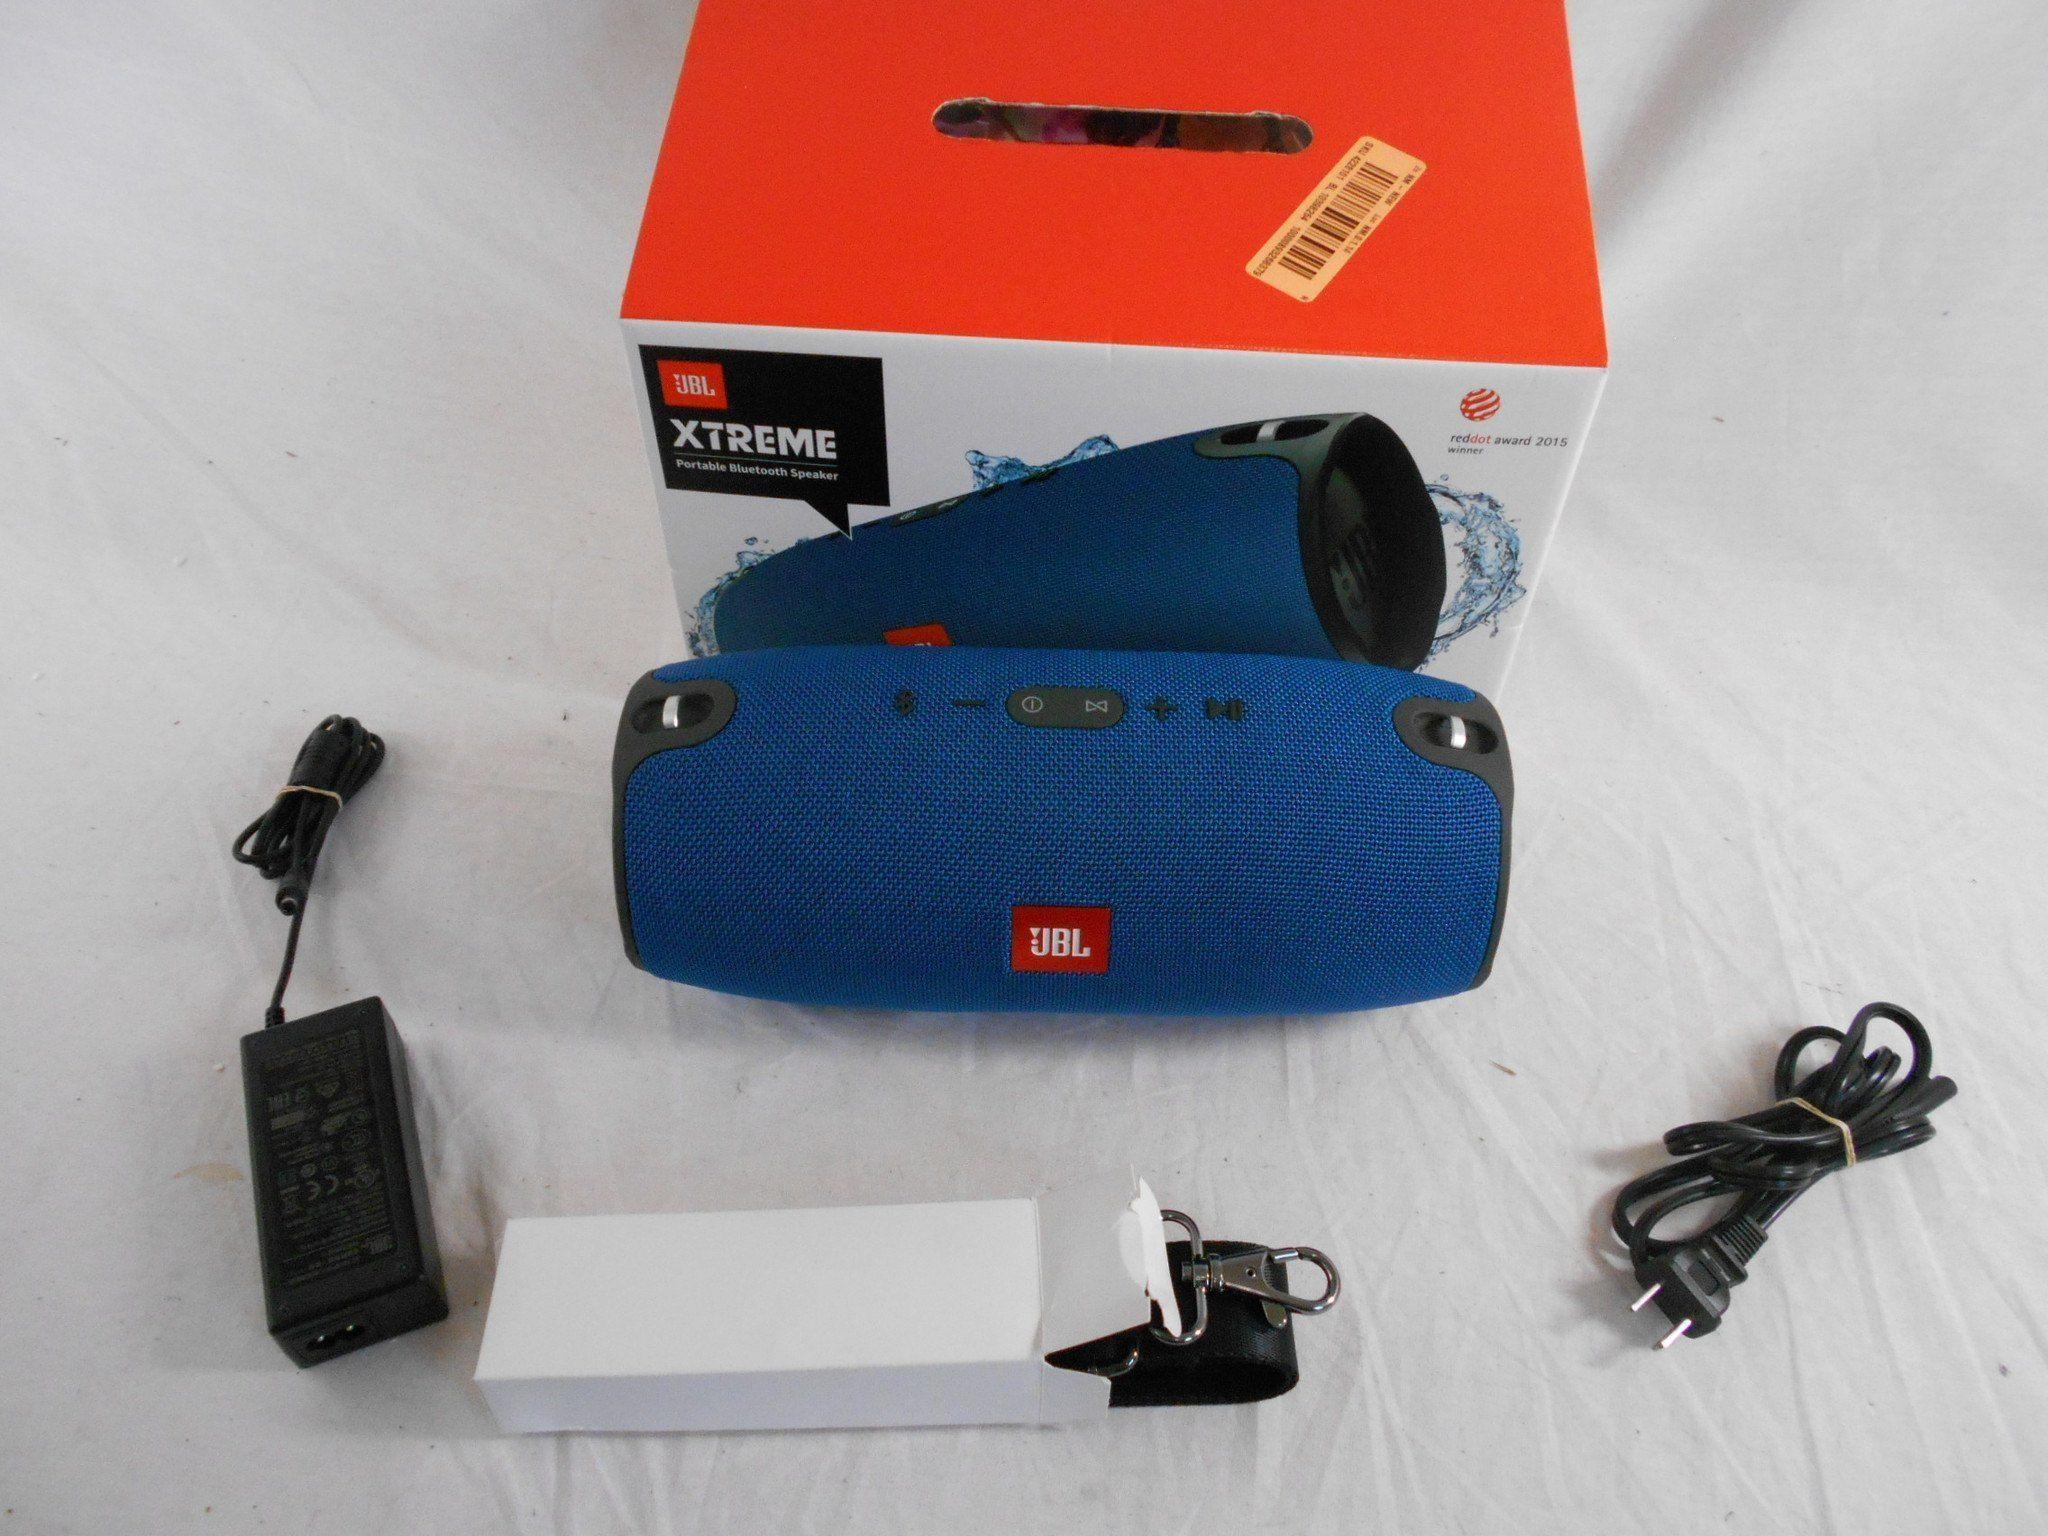 New JBL Xtreme Portable Wireless Bluetooth Speaker - Blue